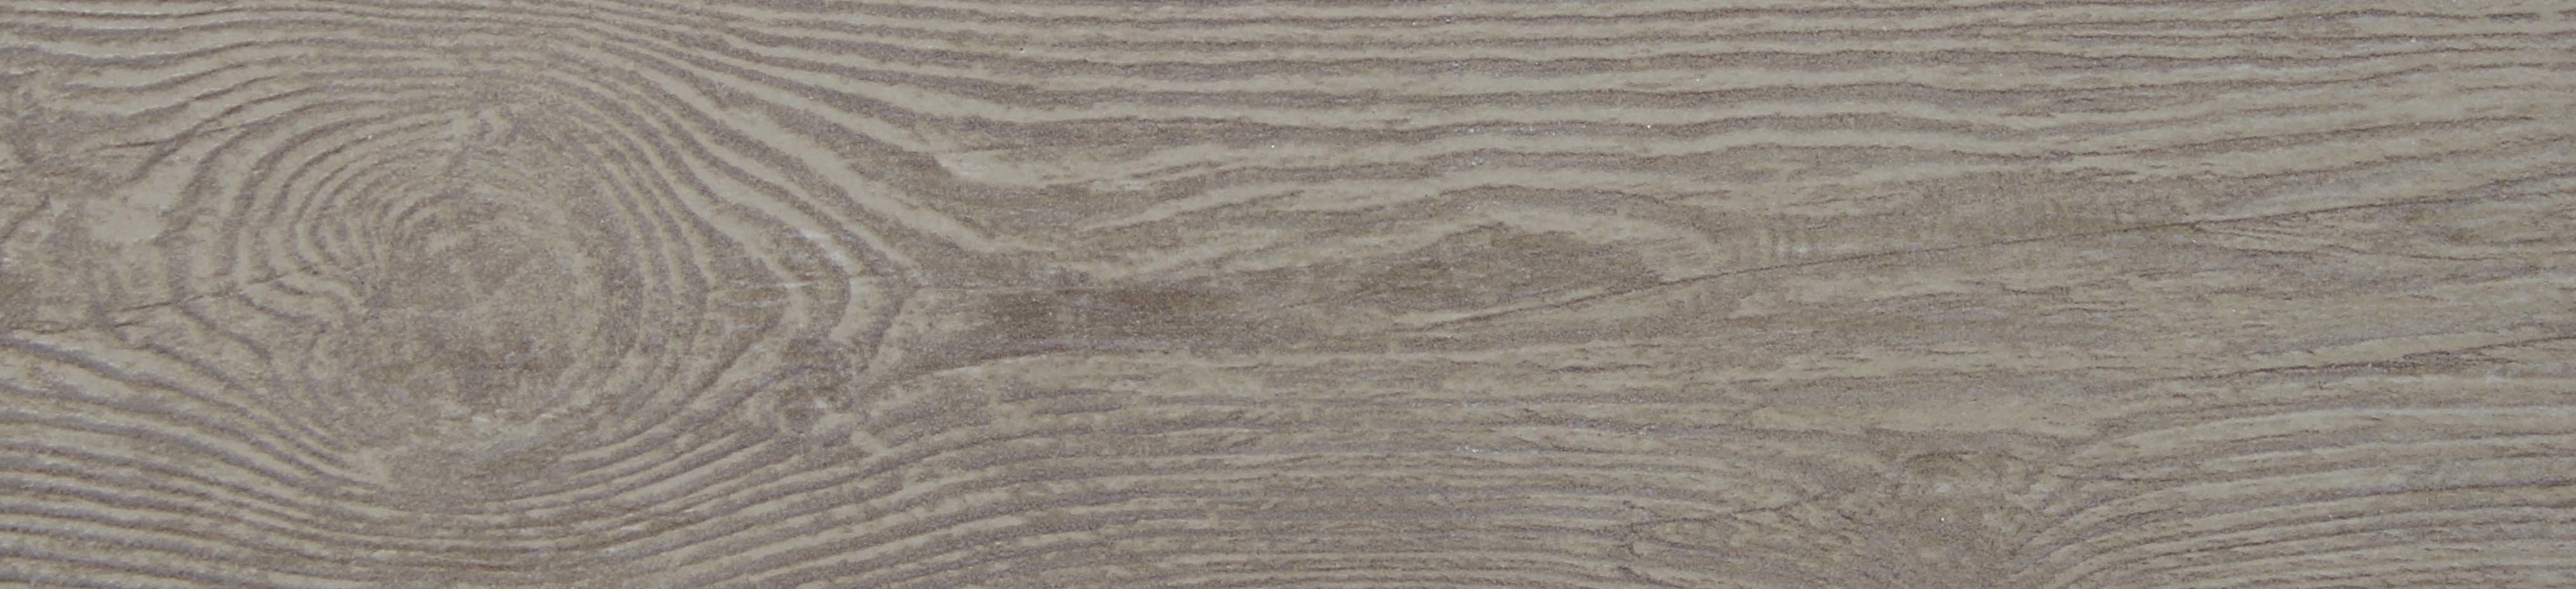 Ceramic tiles suppliers images tile flooring design ideas ceramic tile supplier images tile flooring design ideas ceramic floor tile suppliers images tile flooring design dailygadgetfo Gallery